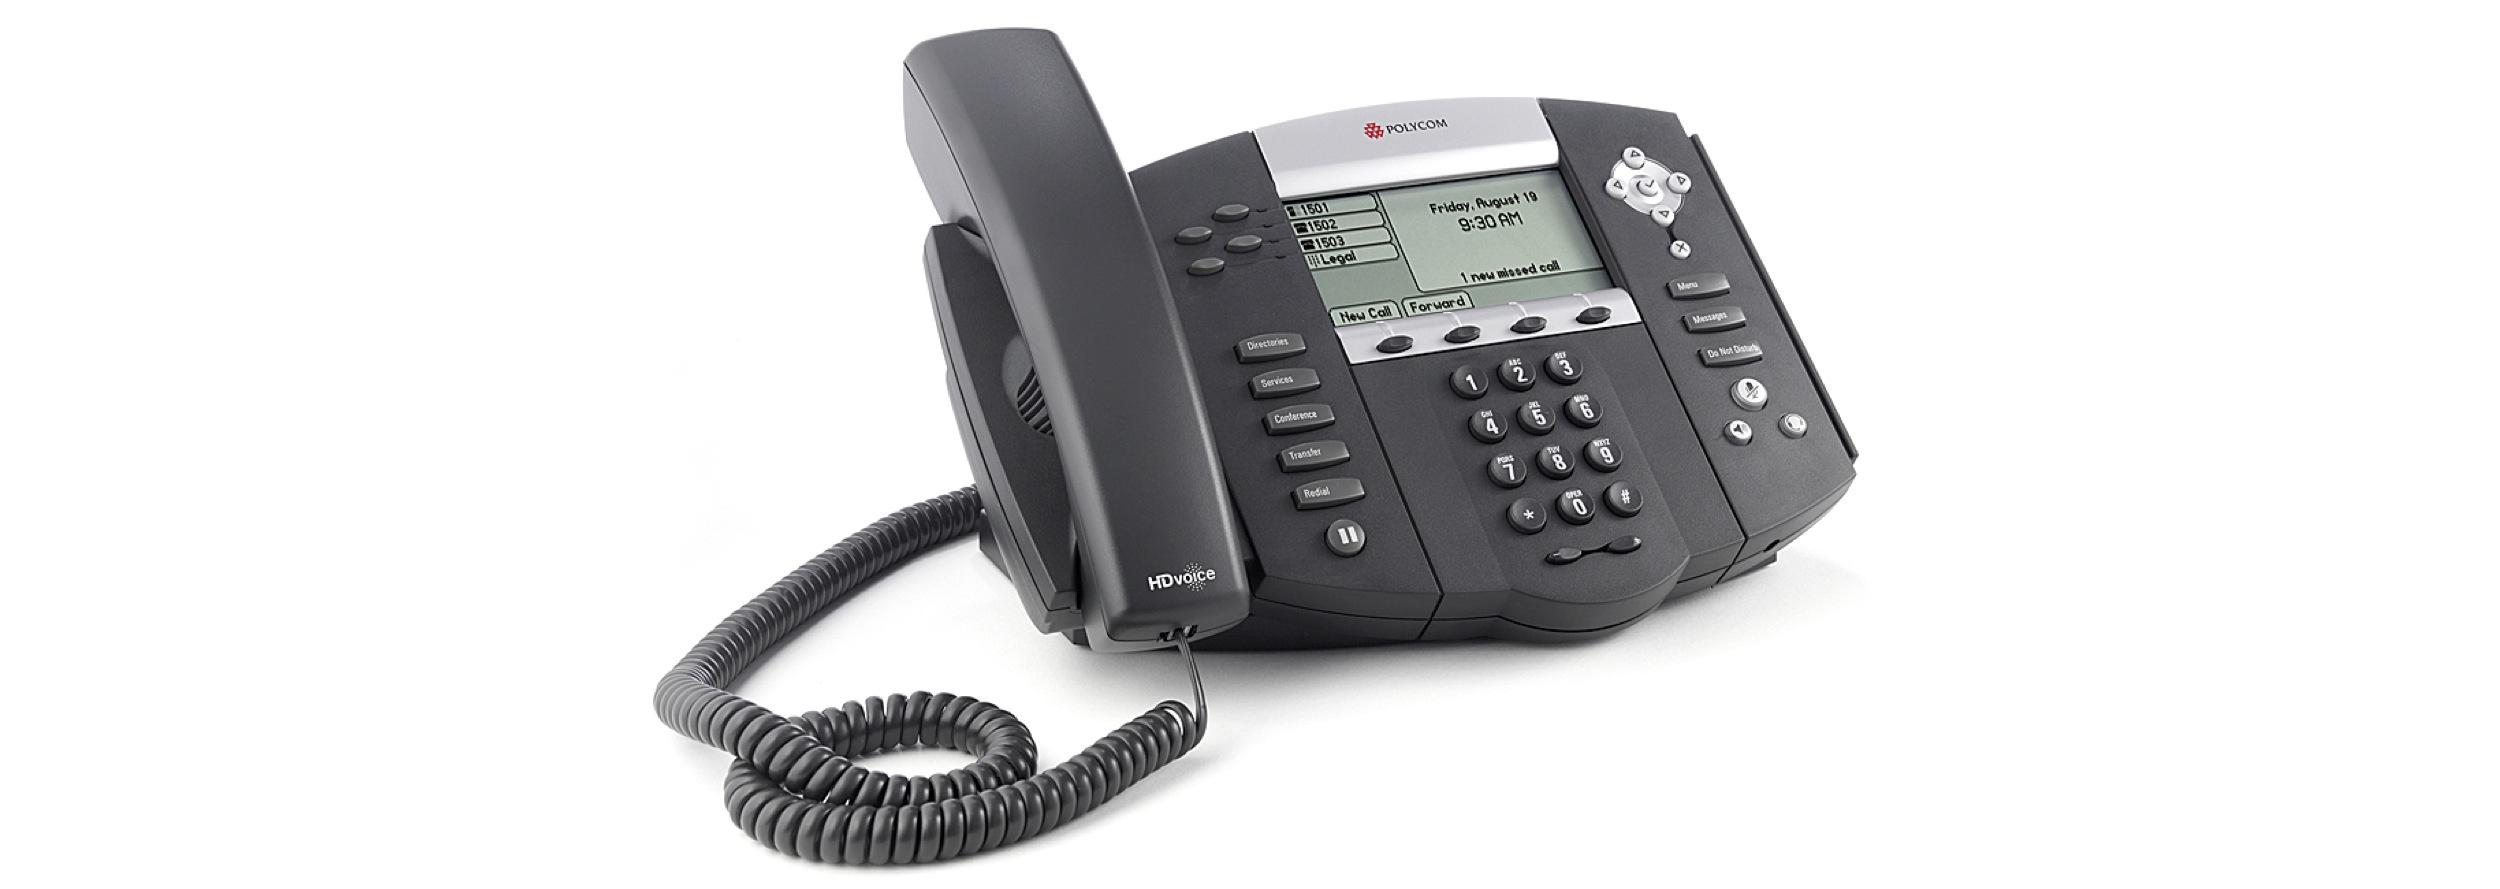 Desktop VoIP Telephone